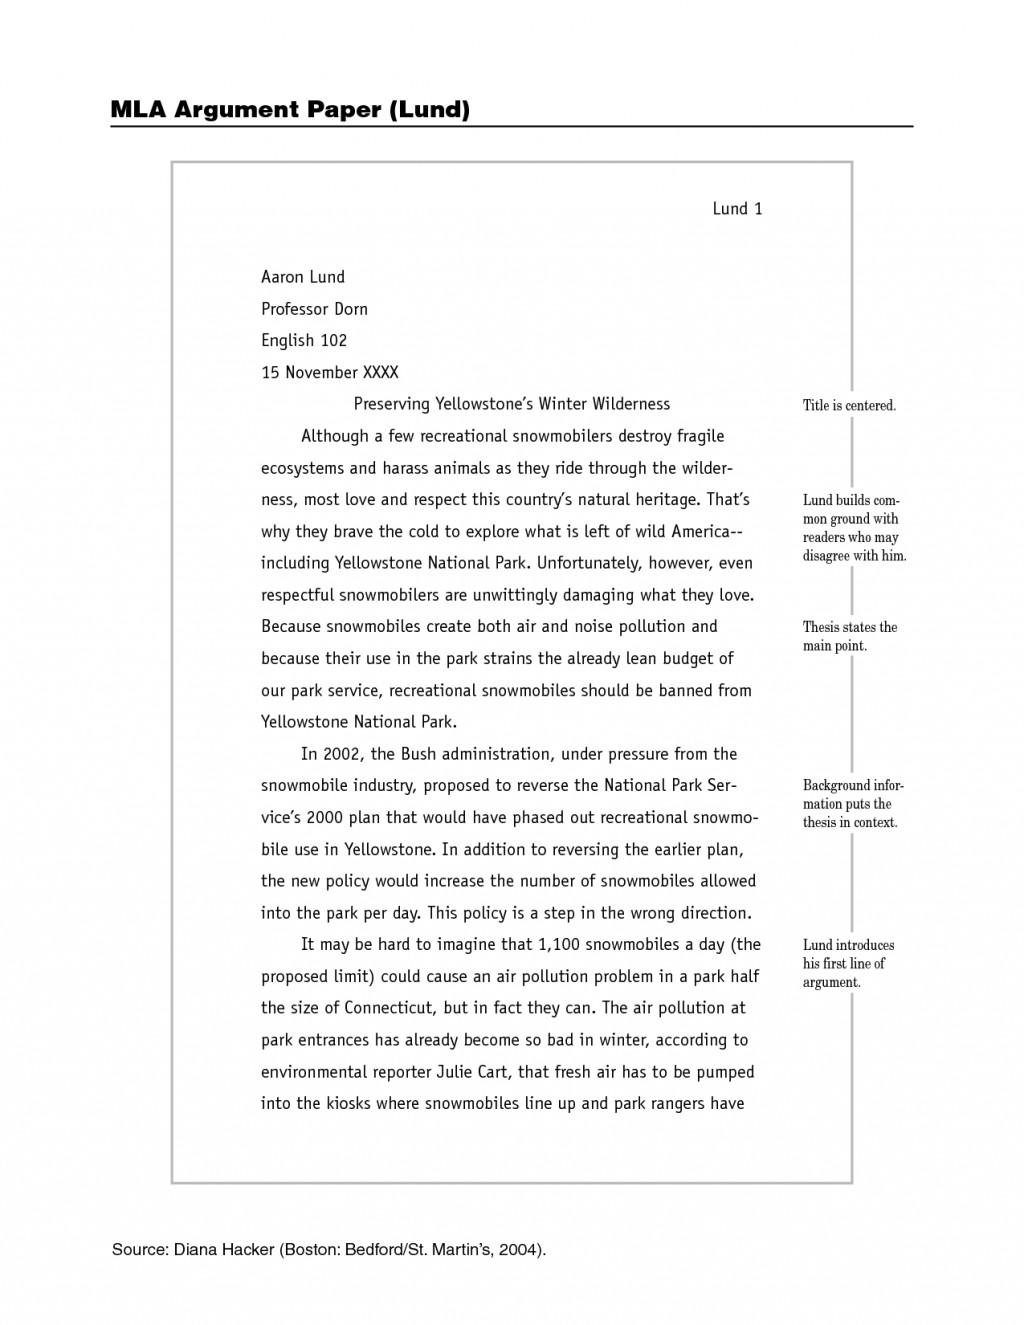 003 Mla Format Essay Sample Example Paper 309602 Beautiful 2017 Comparison Narrative Large